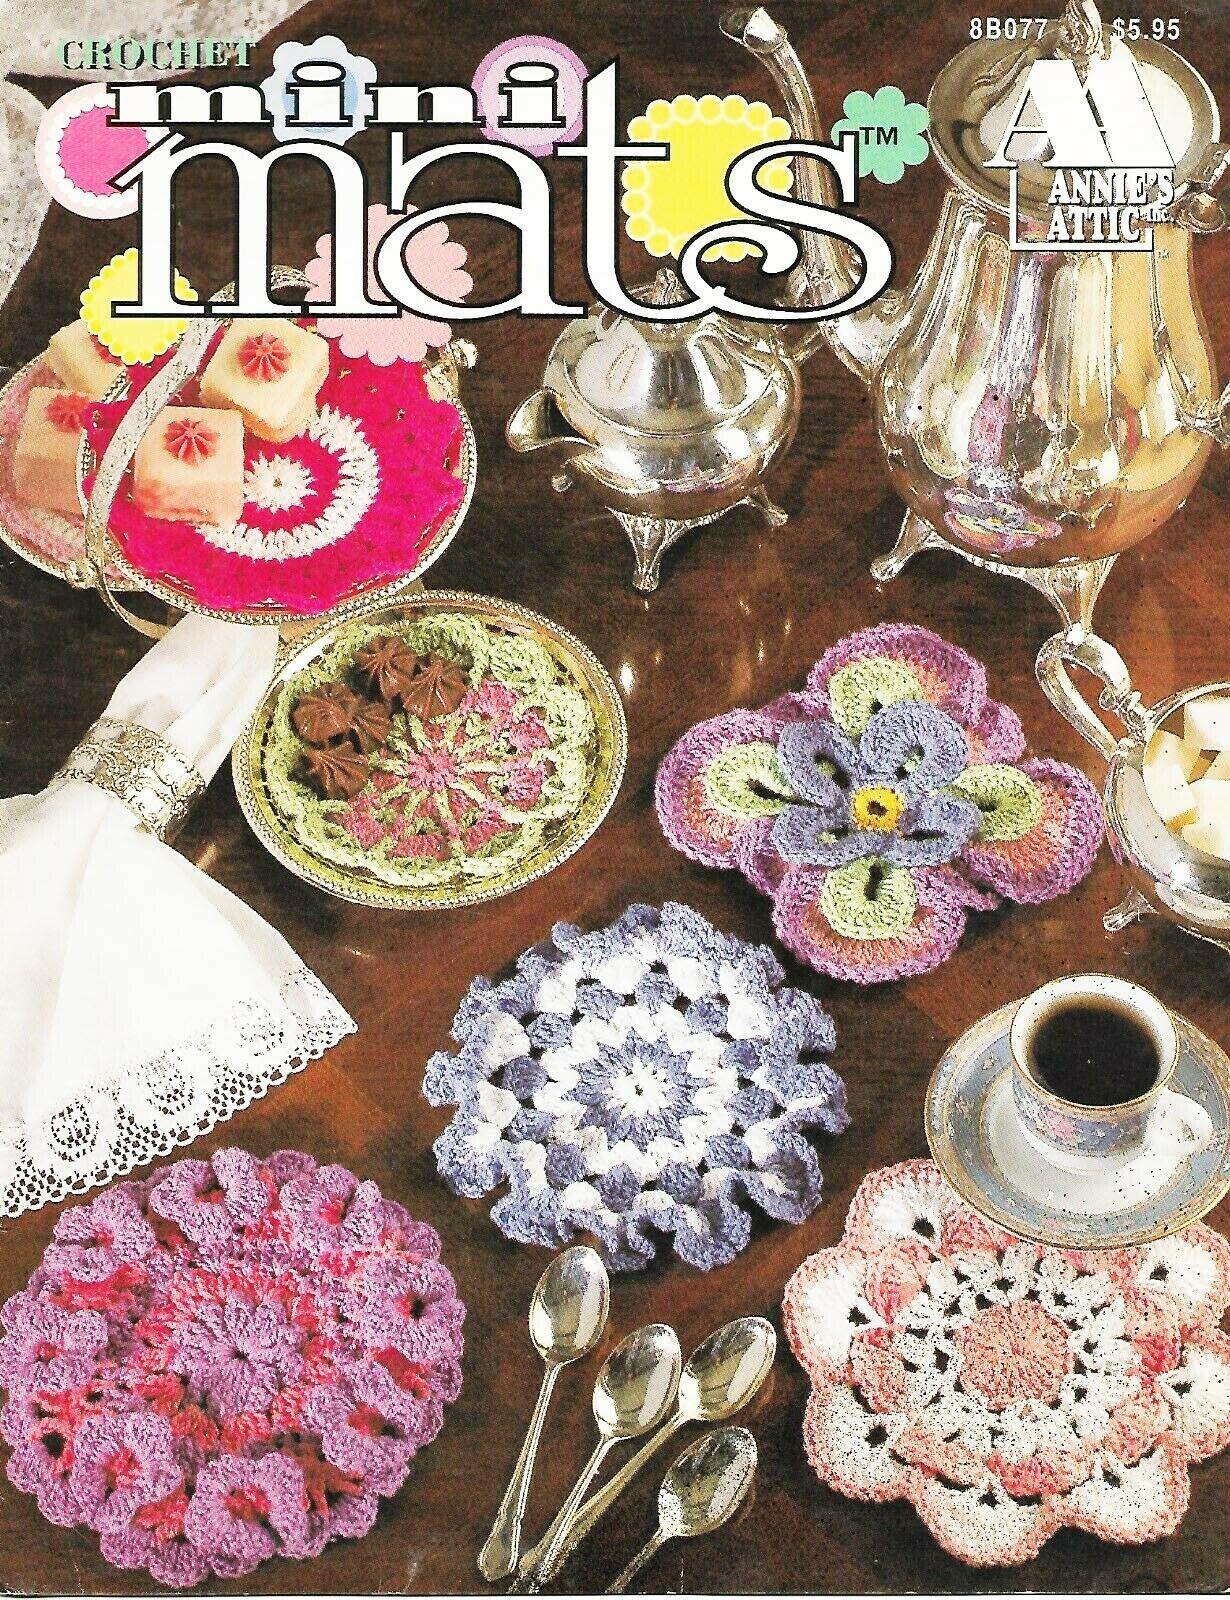 Mini Mats  Annie's Attic Make 12 Beautiful Coaster Mats with Thread  NEW - $8.95